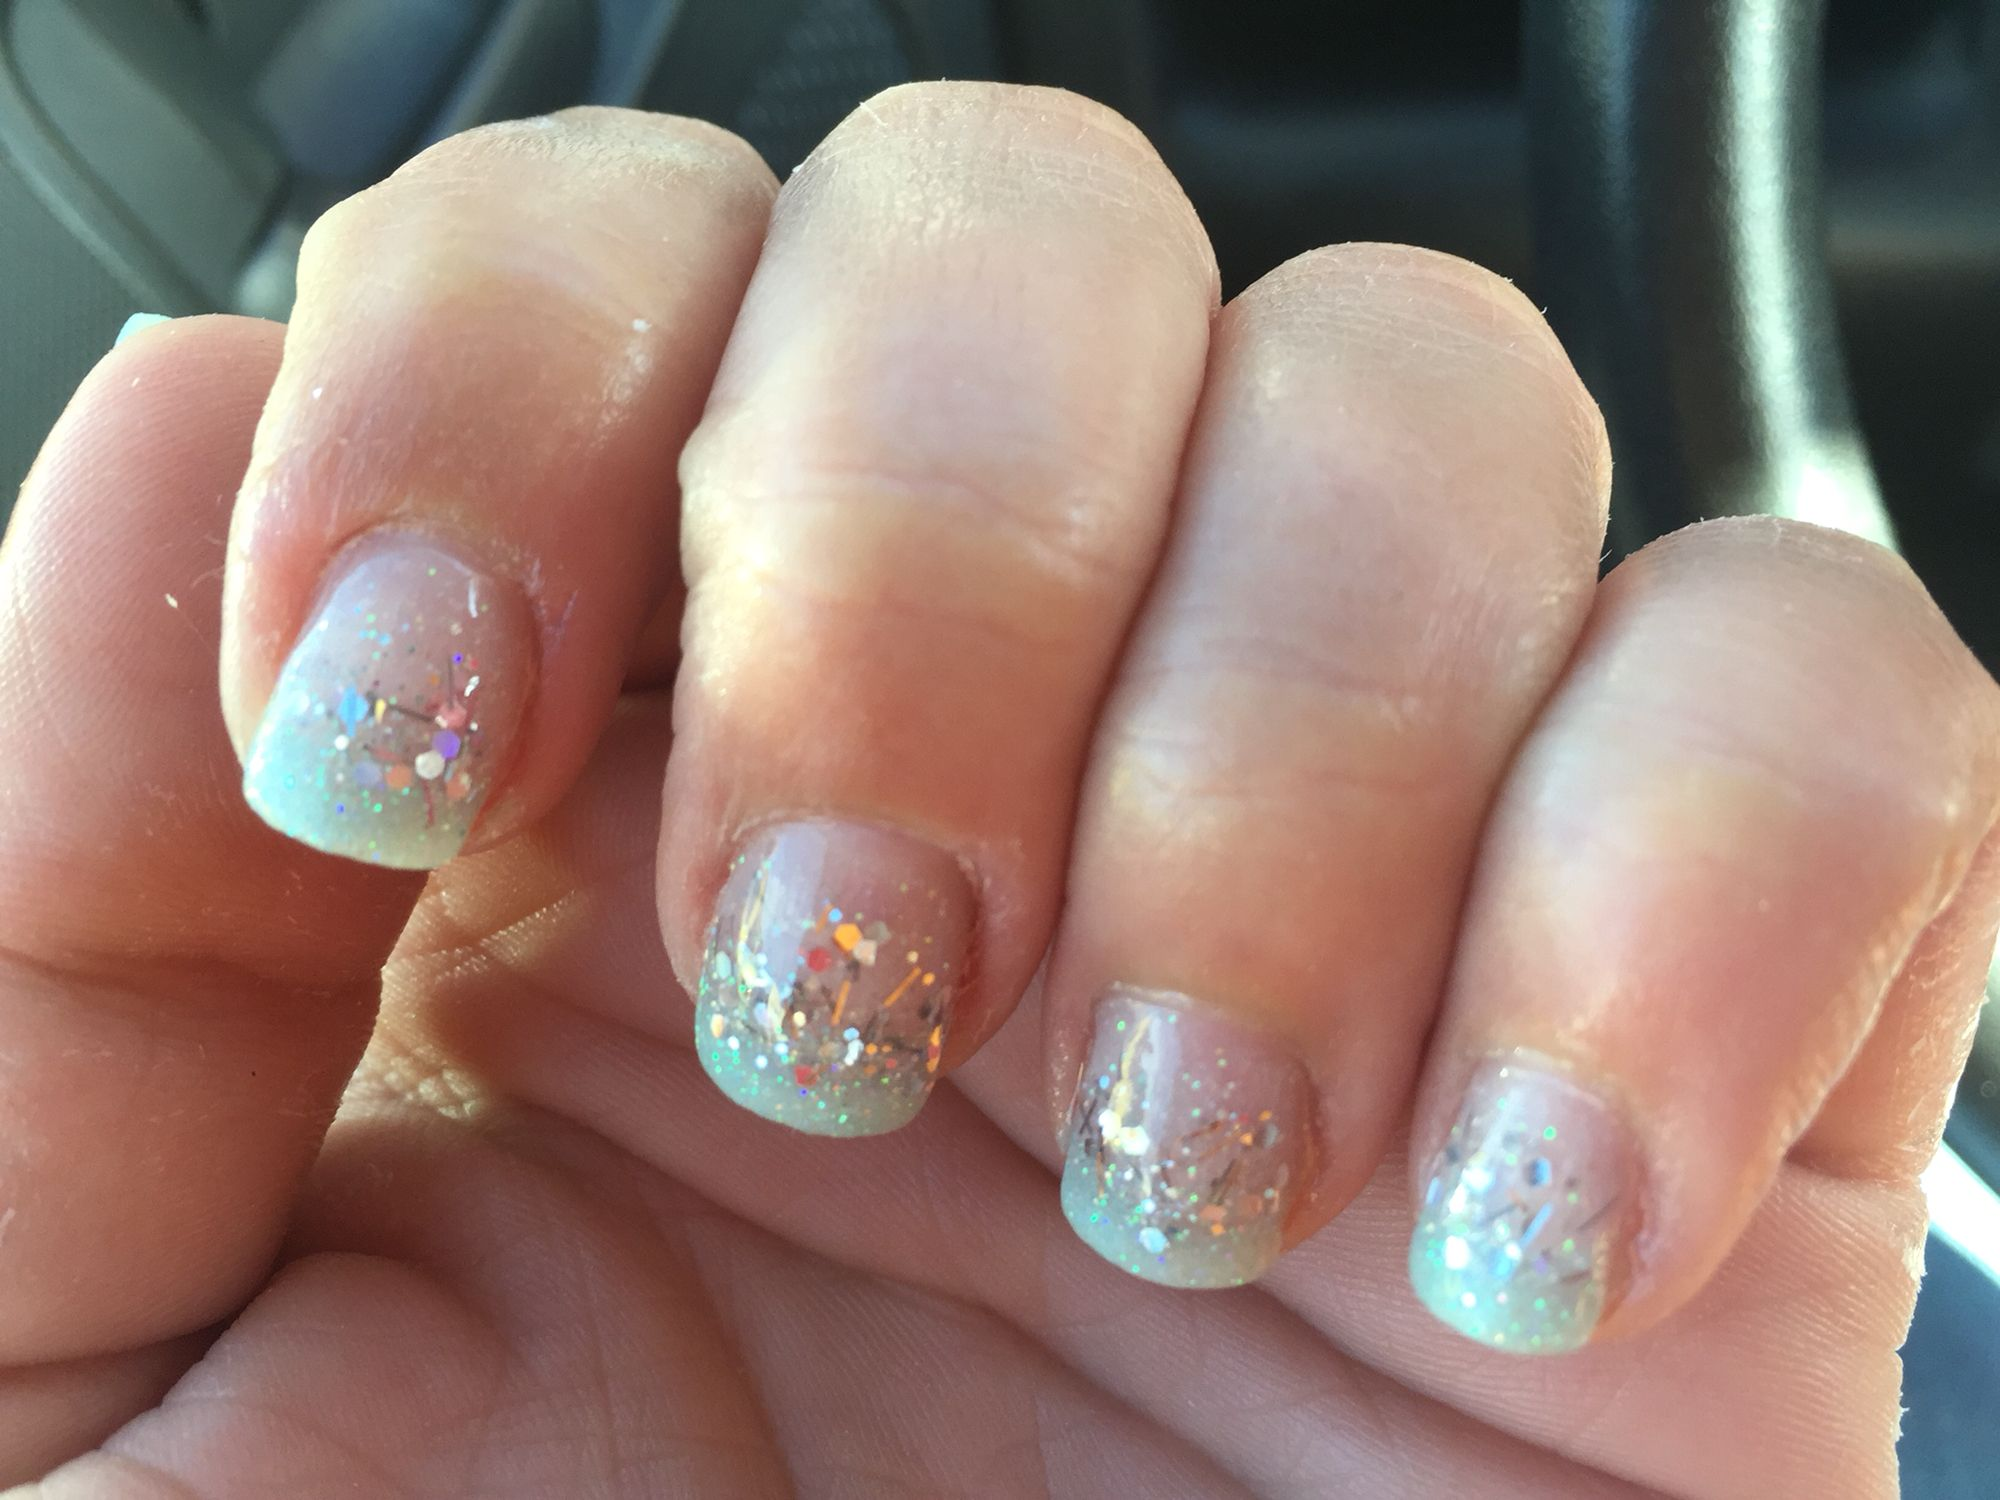 Nexgen nails | nails | Pinterest | Makeup